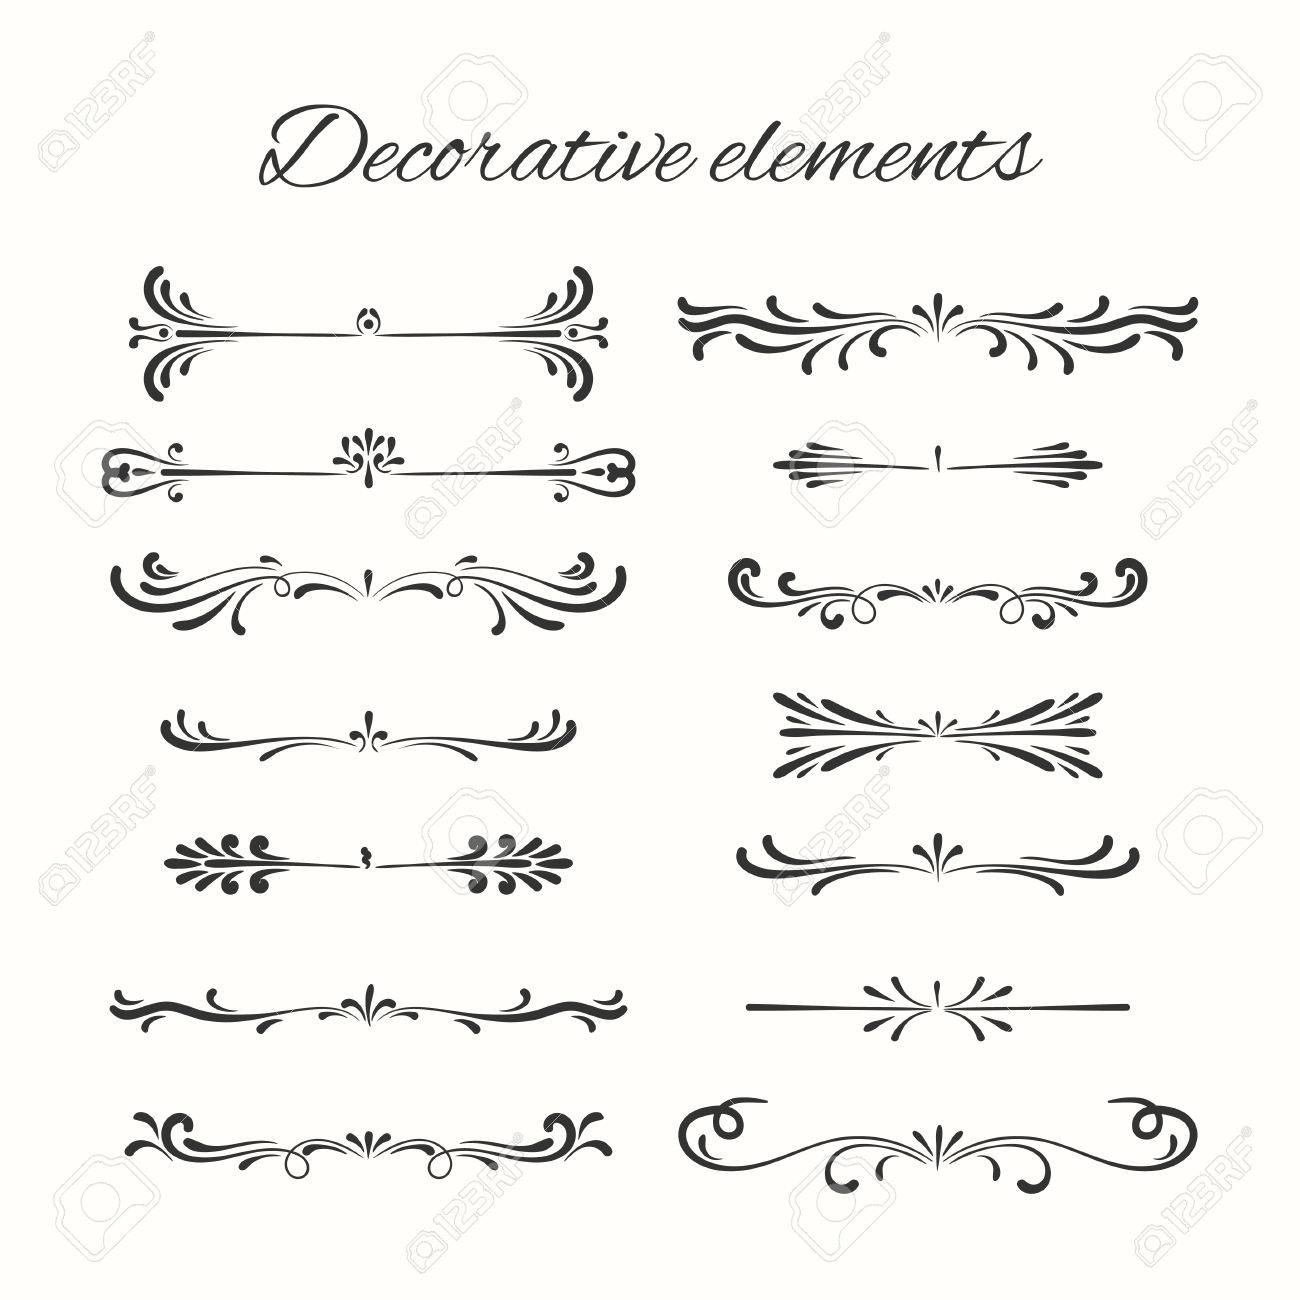 Hand drawn dividers set. Ornamental decorative elements. Vector ornate elements design. - 51559265